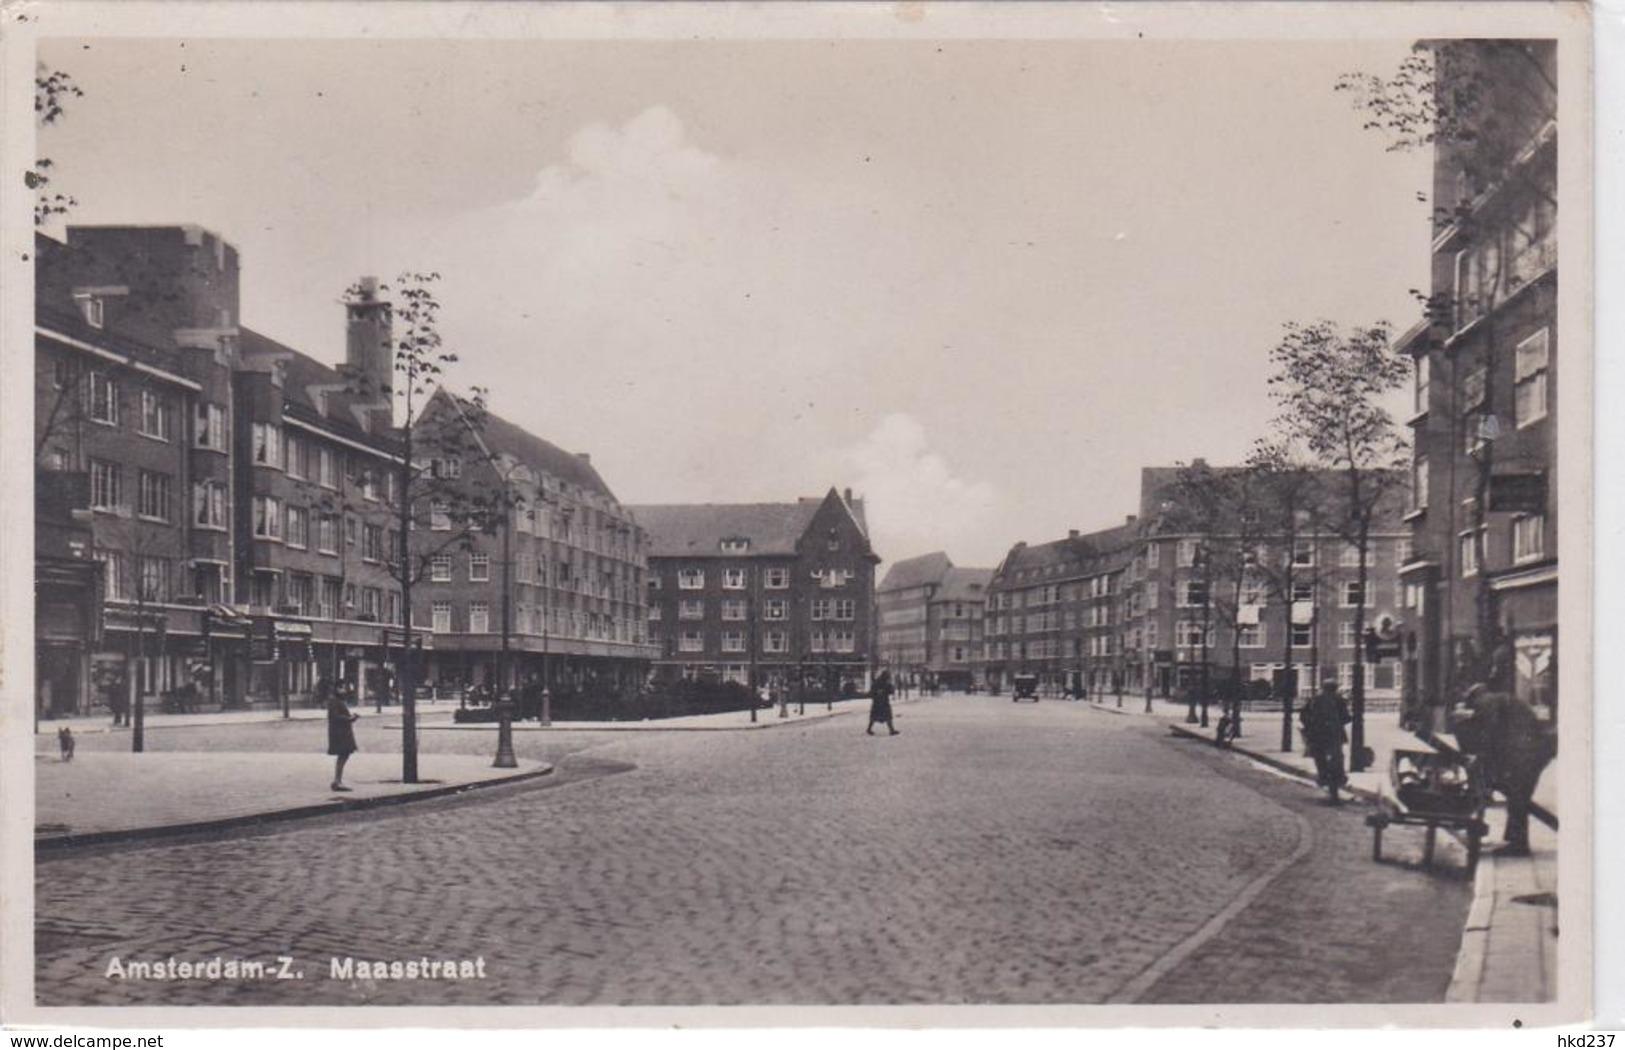 Amsterdam-Z. Maasstraat Volk 1167 - Amsterdam